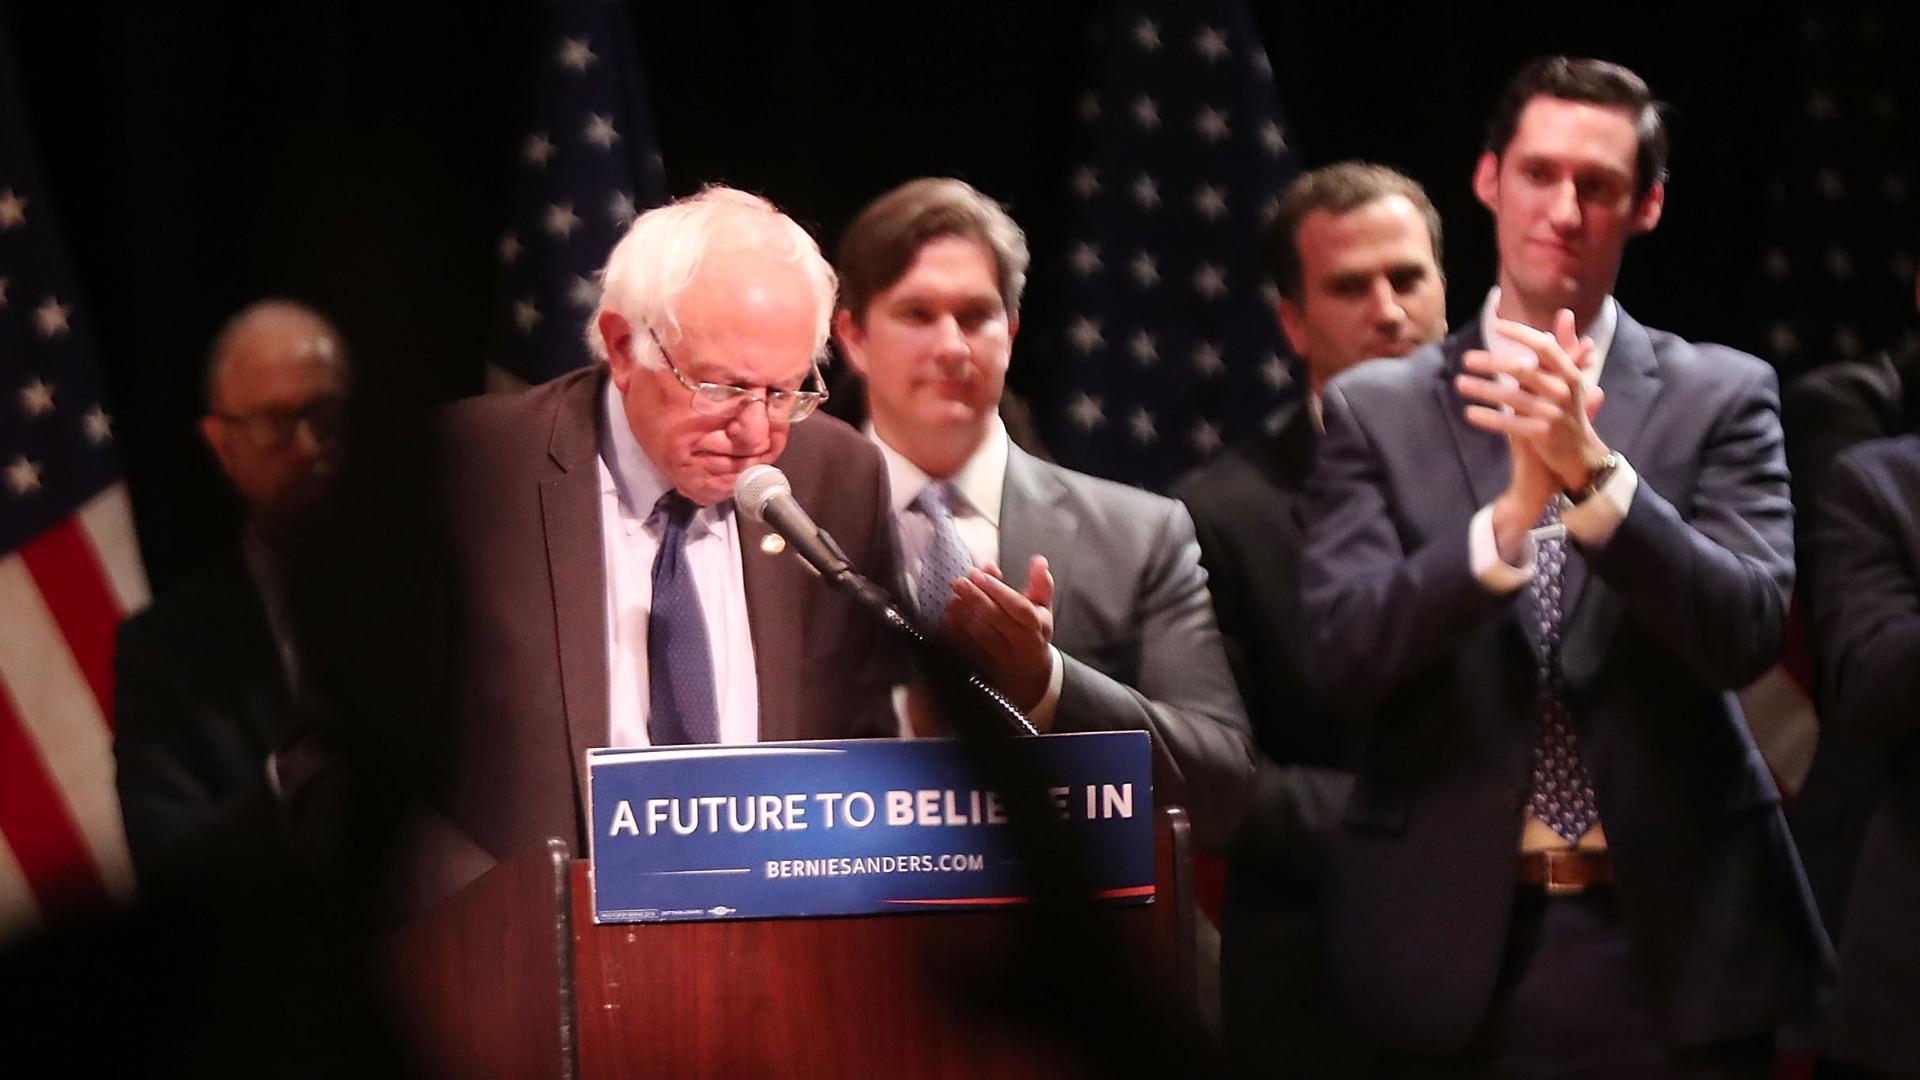 Bernie Sanders's stubbornness is a big mistake